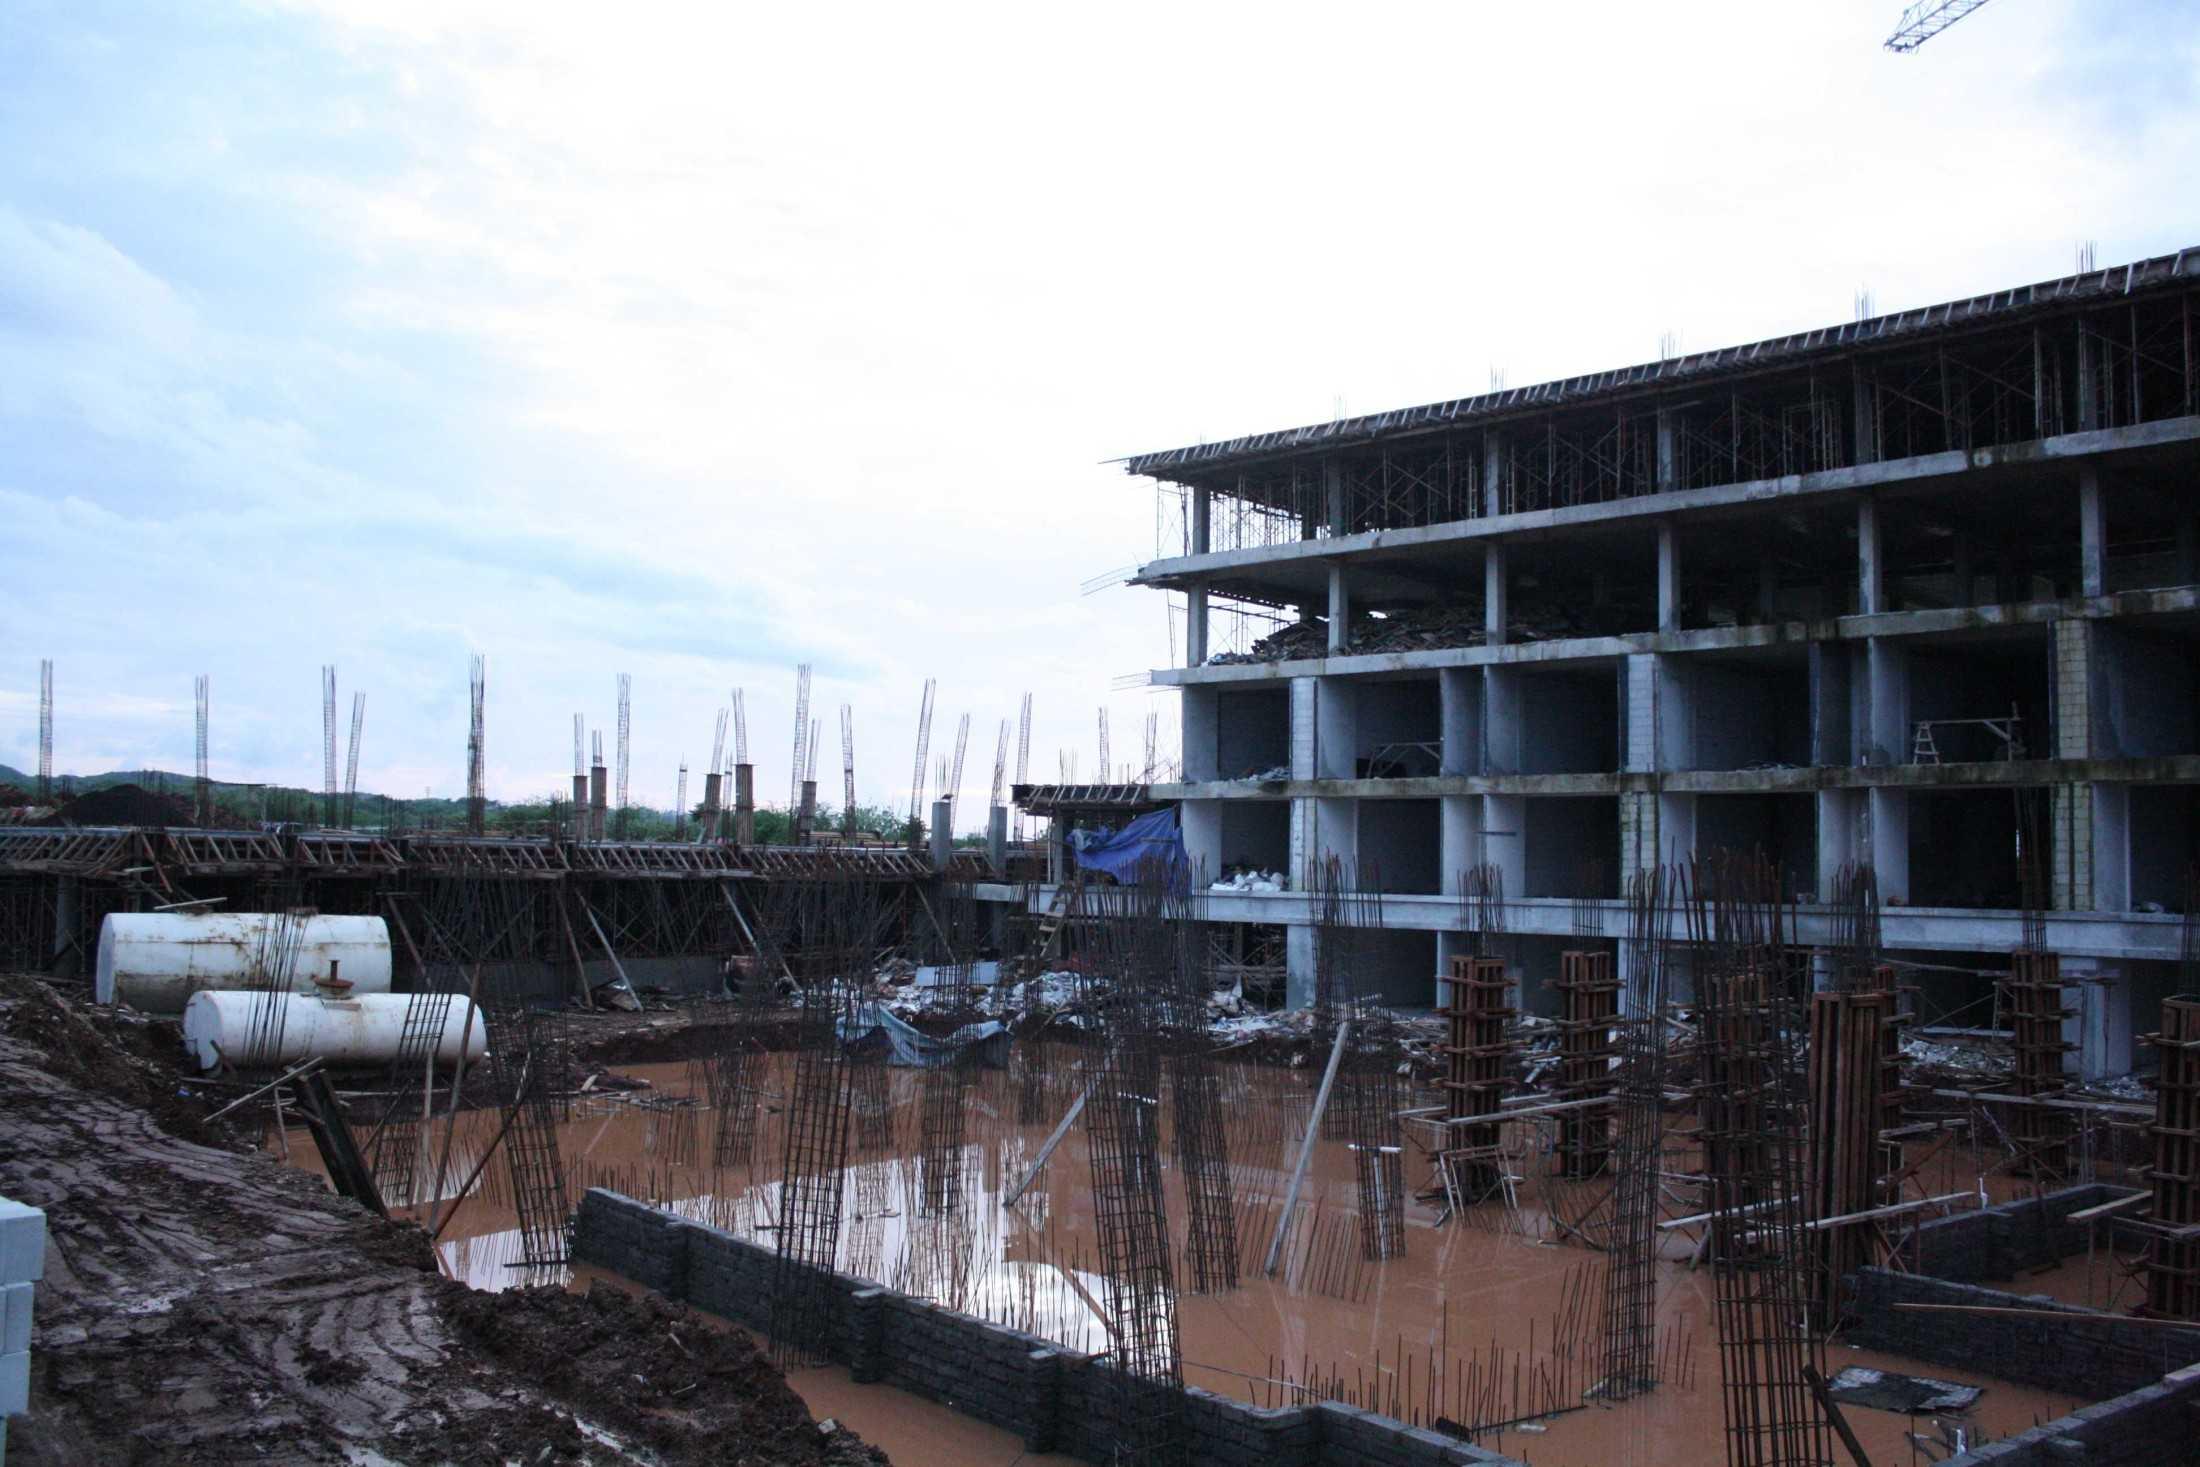 Diro Karya Construction Proyek Hotel The Rich Prada Bali Jl. Pecatu Indah Resort Blok B2, Pecatu, South Kuta, Badung Regency, Bali 80361, Indonesia Jl. Pecatu Indah Resort Blok B2, Pecatu, South Kuta, Badung Regency, Bali 80361, Indonesia Diro-Karya-Construction-Proyek-Hotel-The-Rich-Prada-Bali  72576